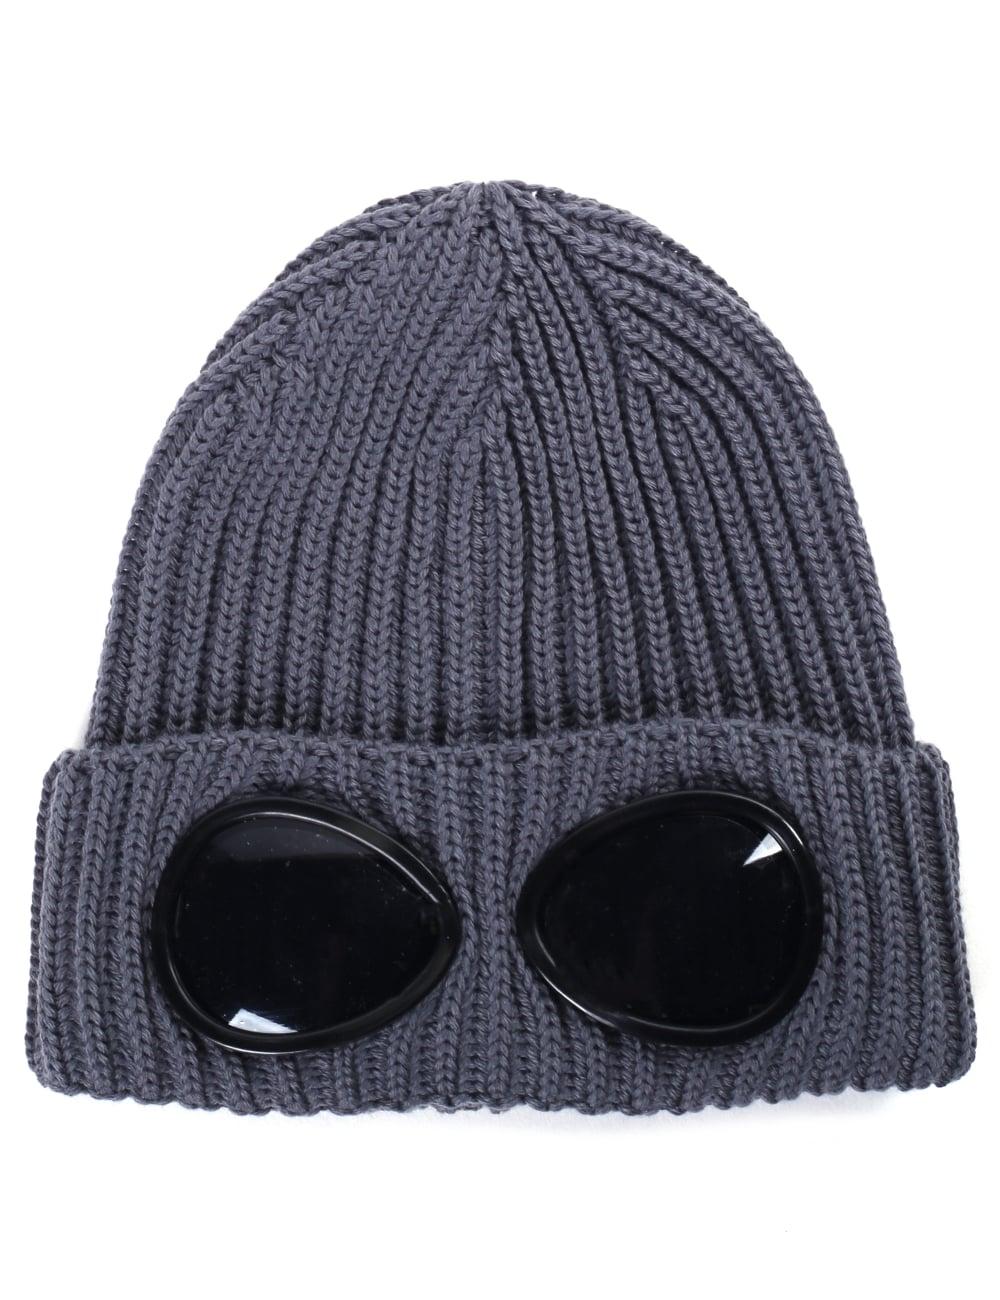 4f9207cadc2 C.P. Company Boys Goggle Beanie Hat